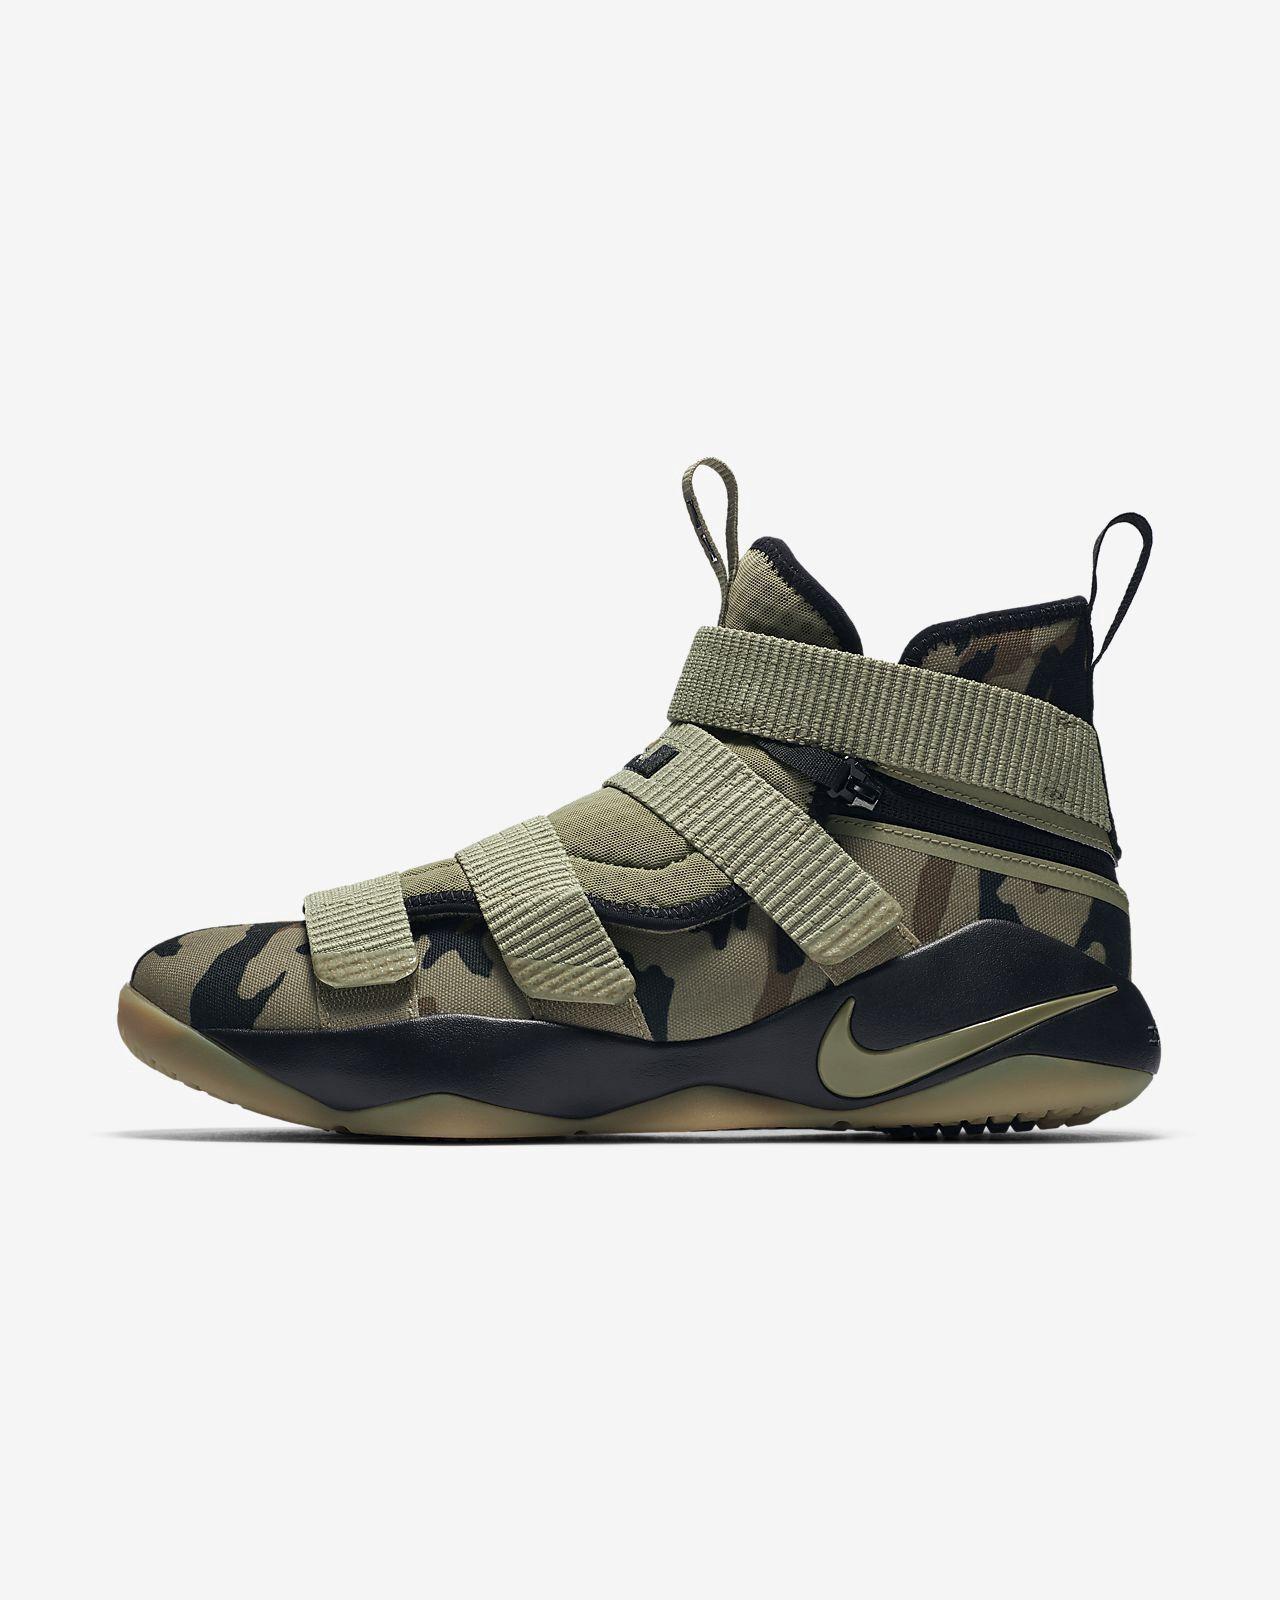 160a48684da2 Nike Lebron Soldier Xi Flyease Basketball Shoe - M 12.5   W 14 ...